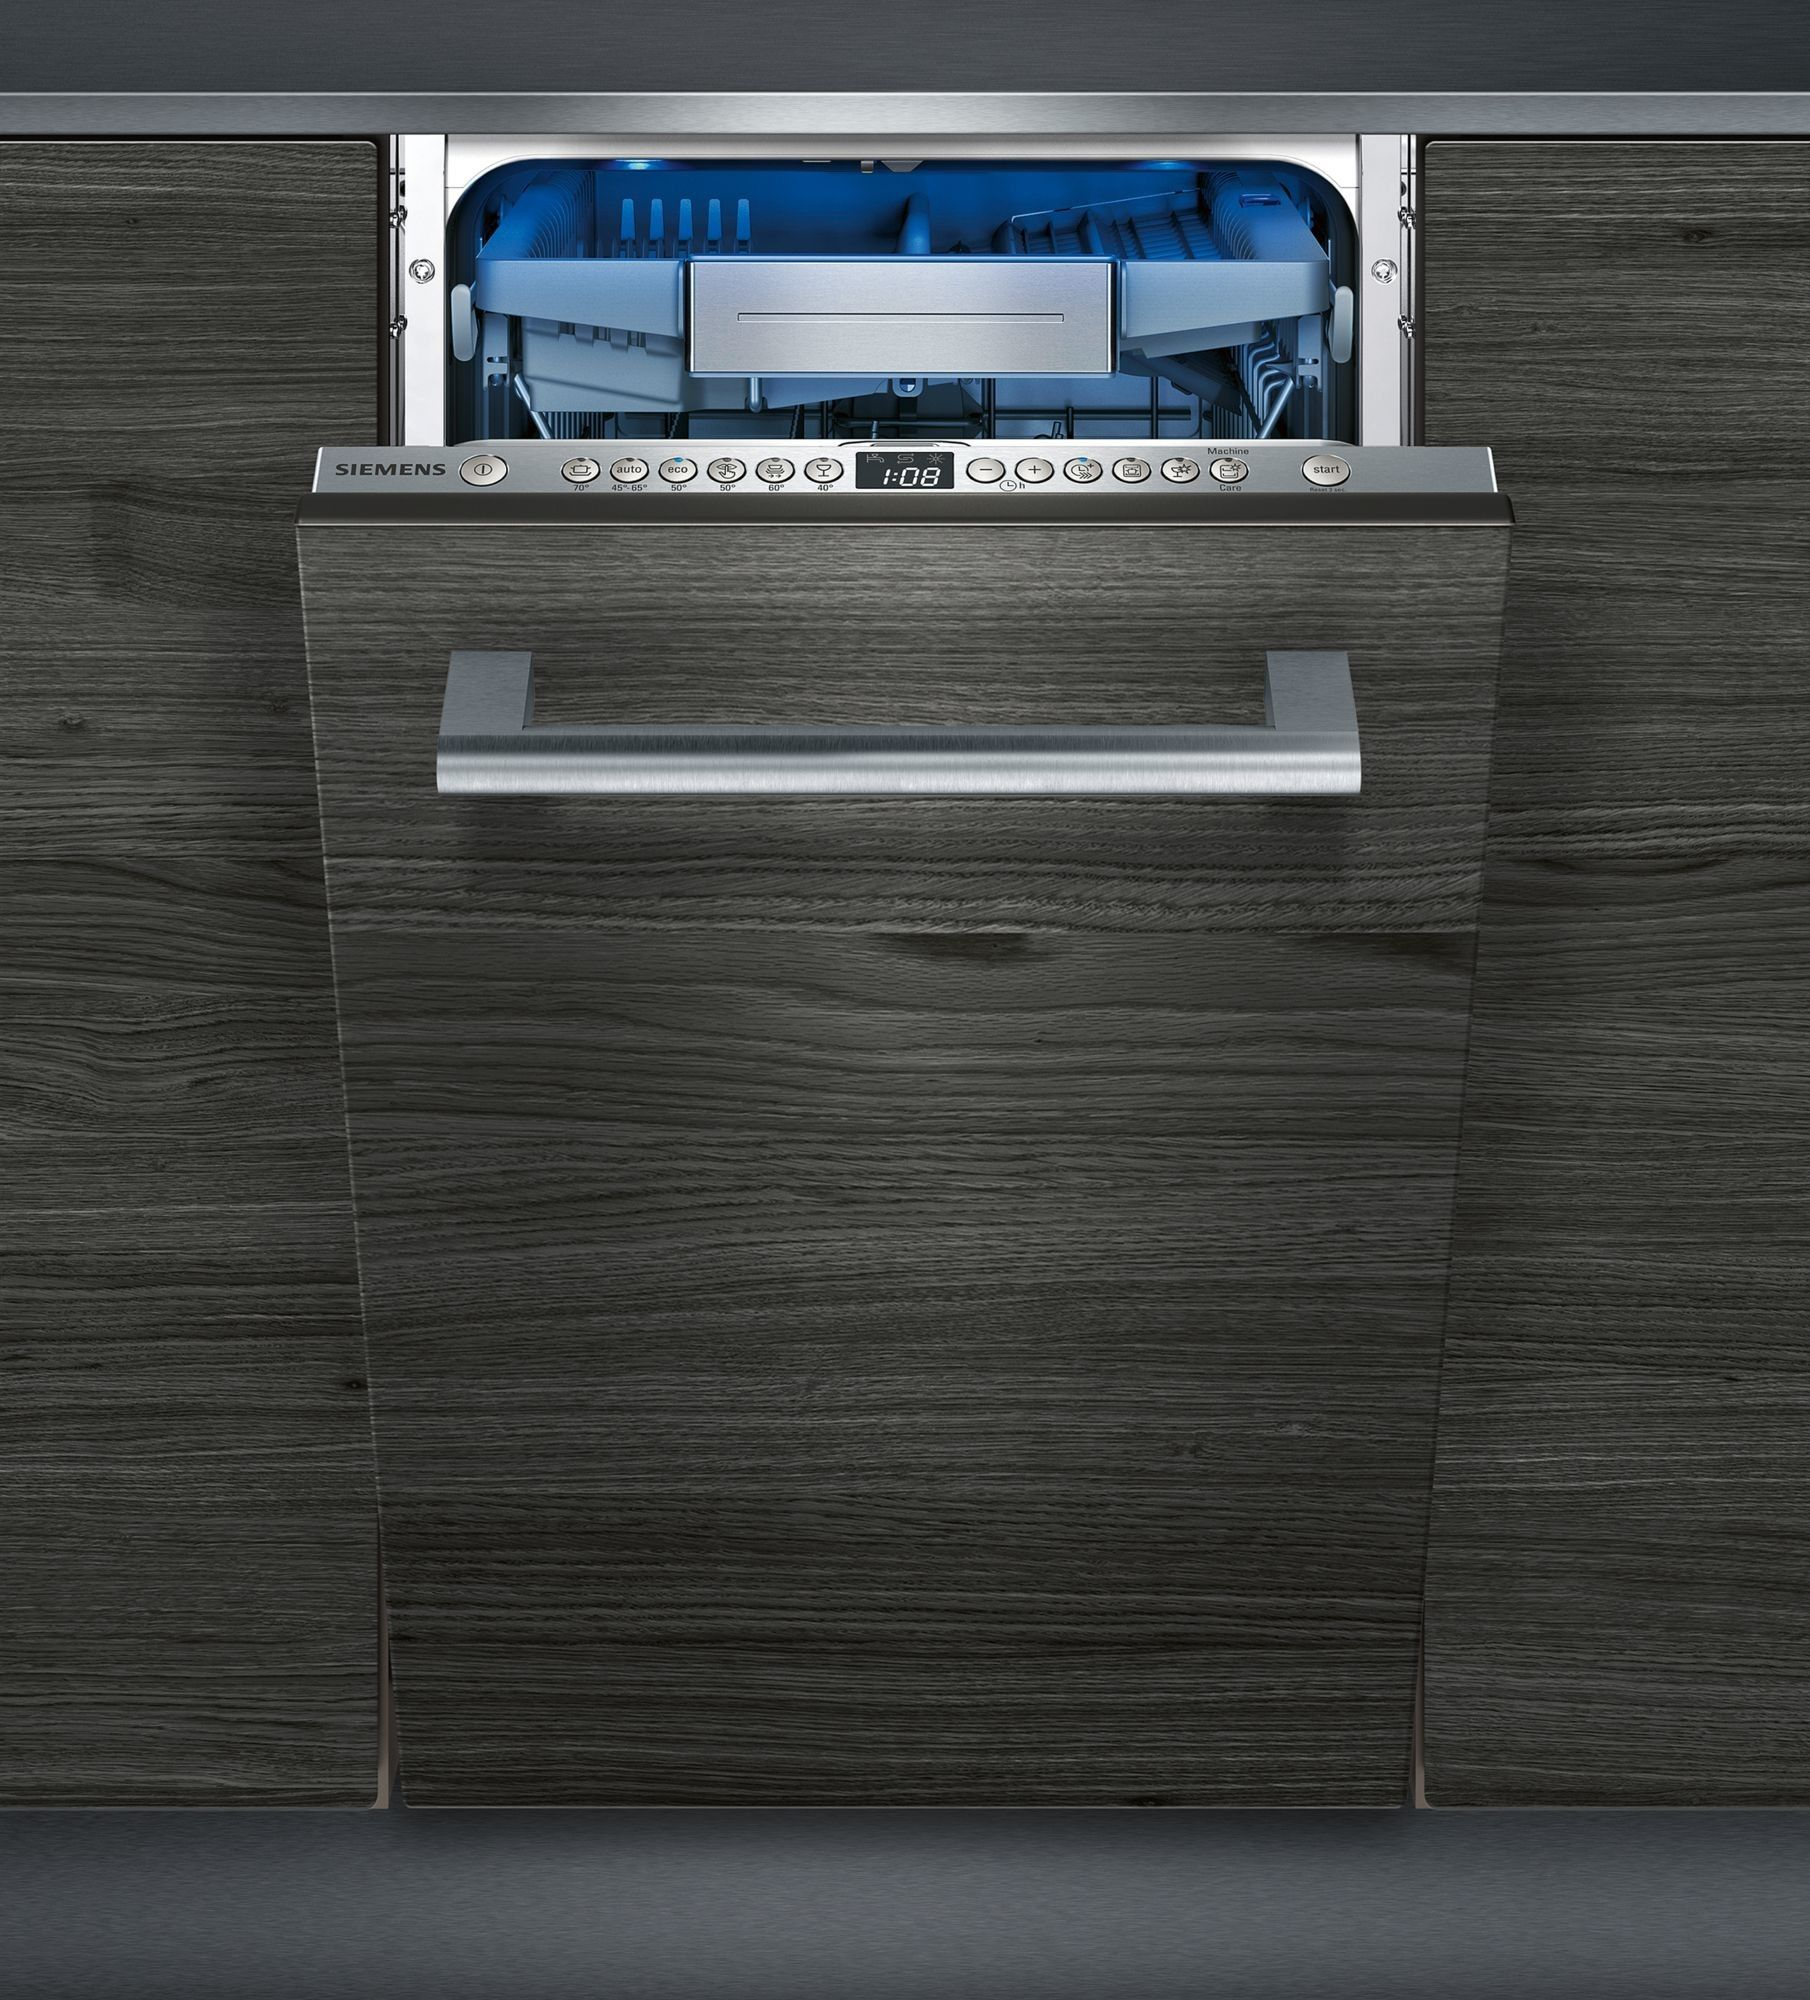 Buy Siemens iQ500 SR656X01TE dishwasher Fully builtin 10